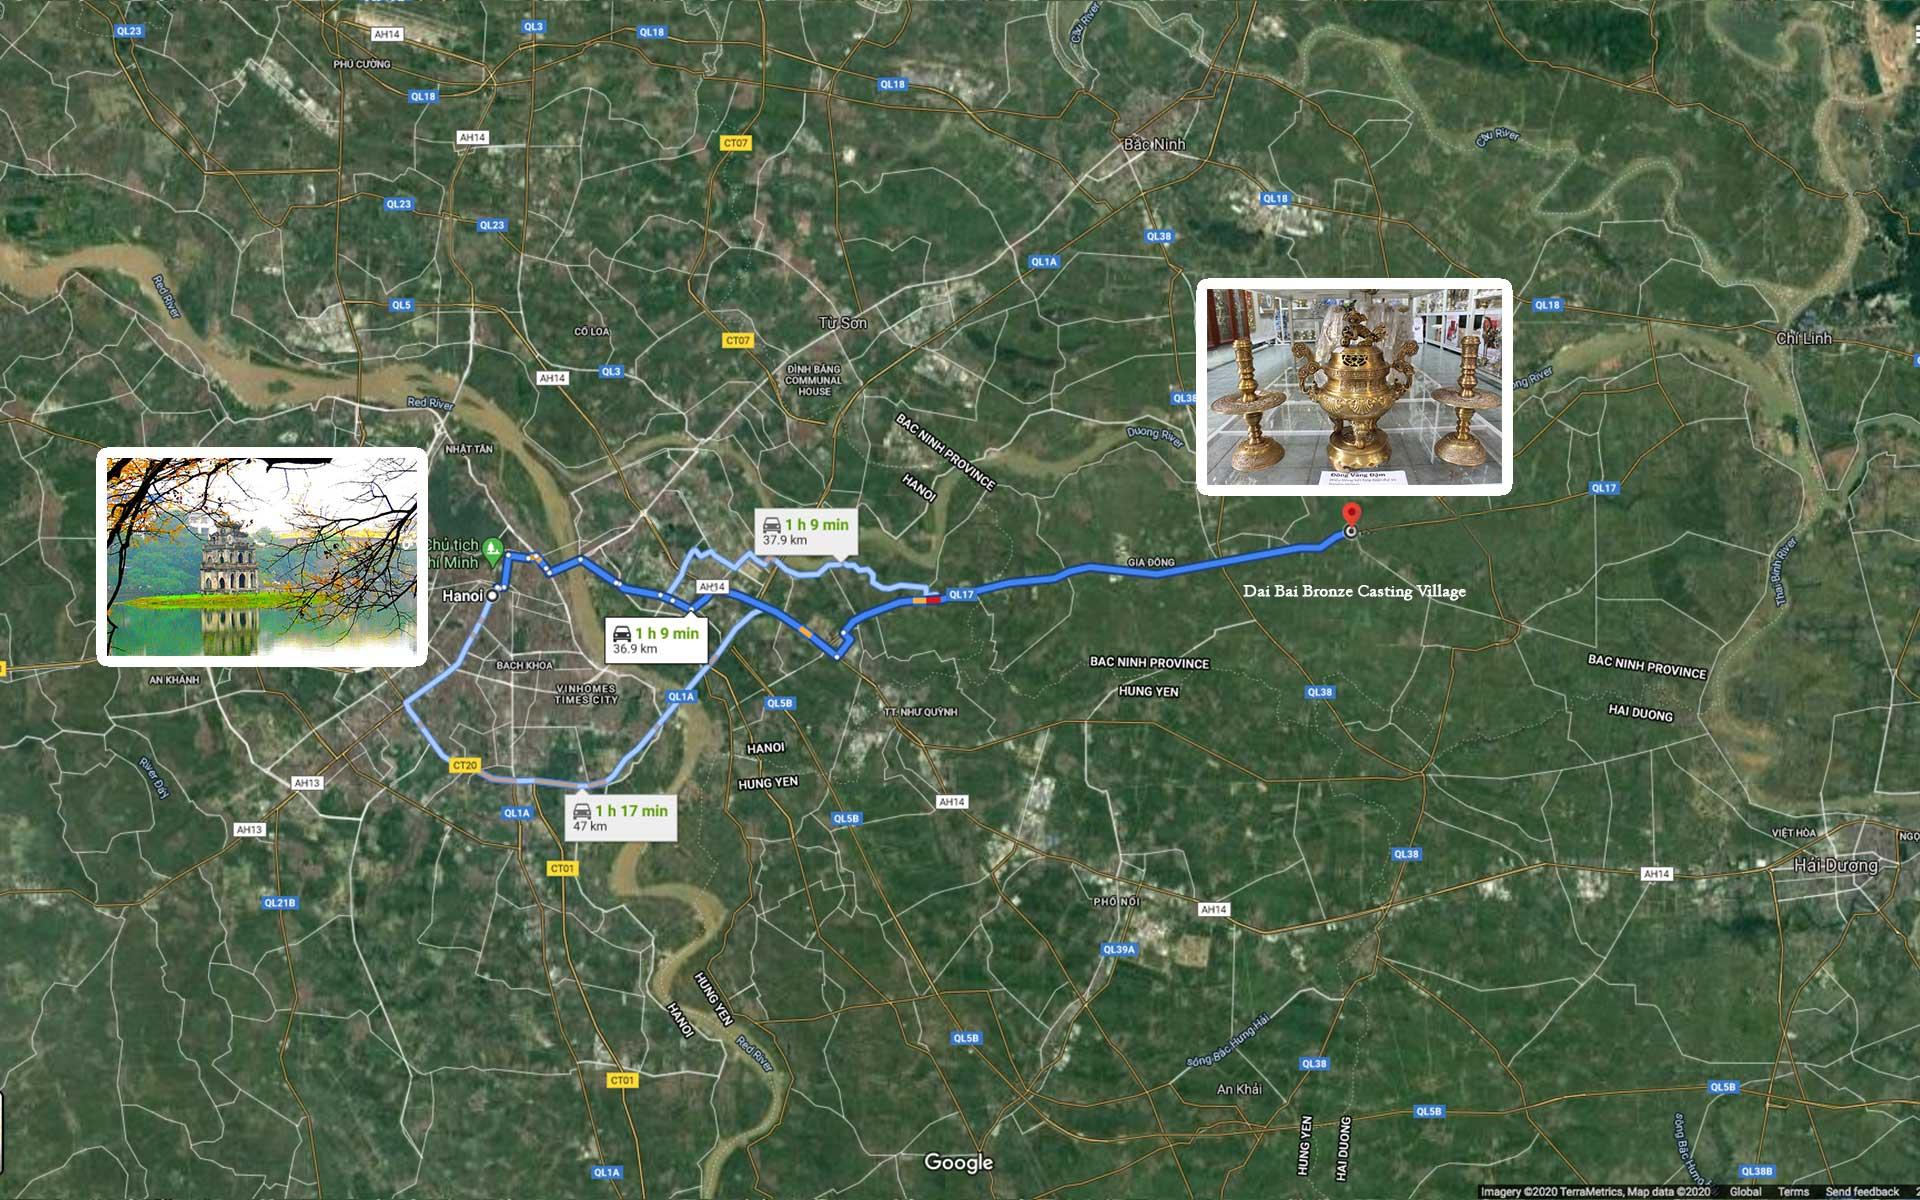 map Hanoi to Dai Bai village